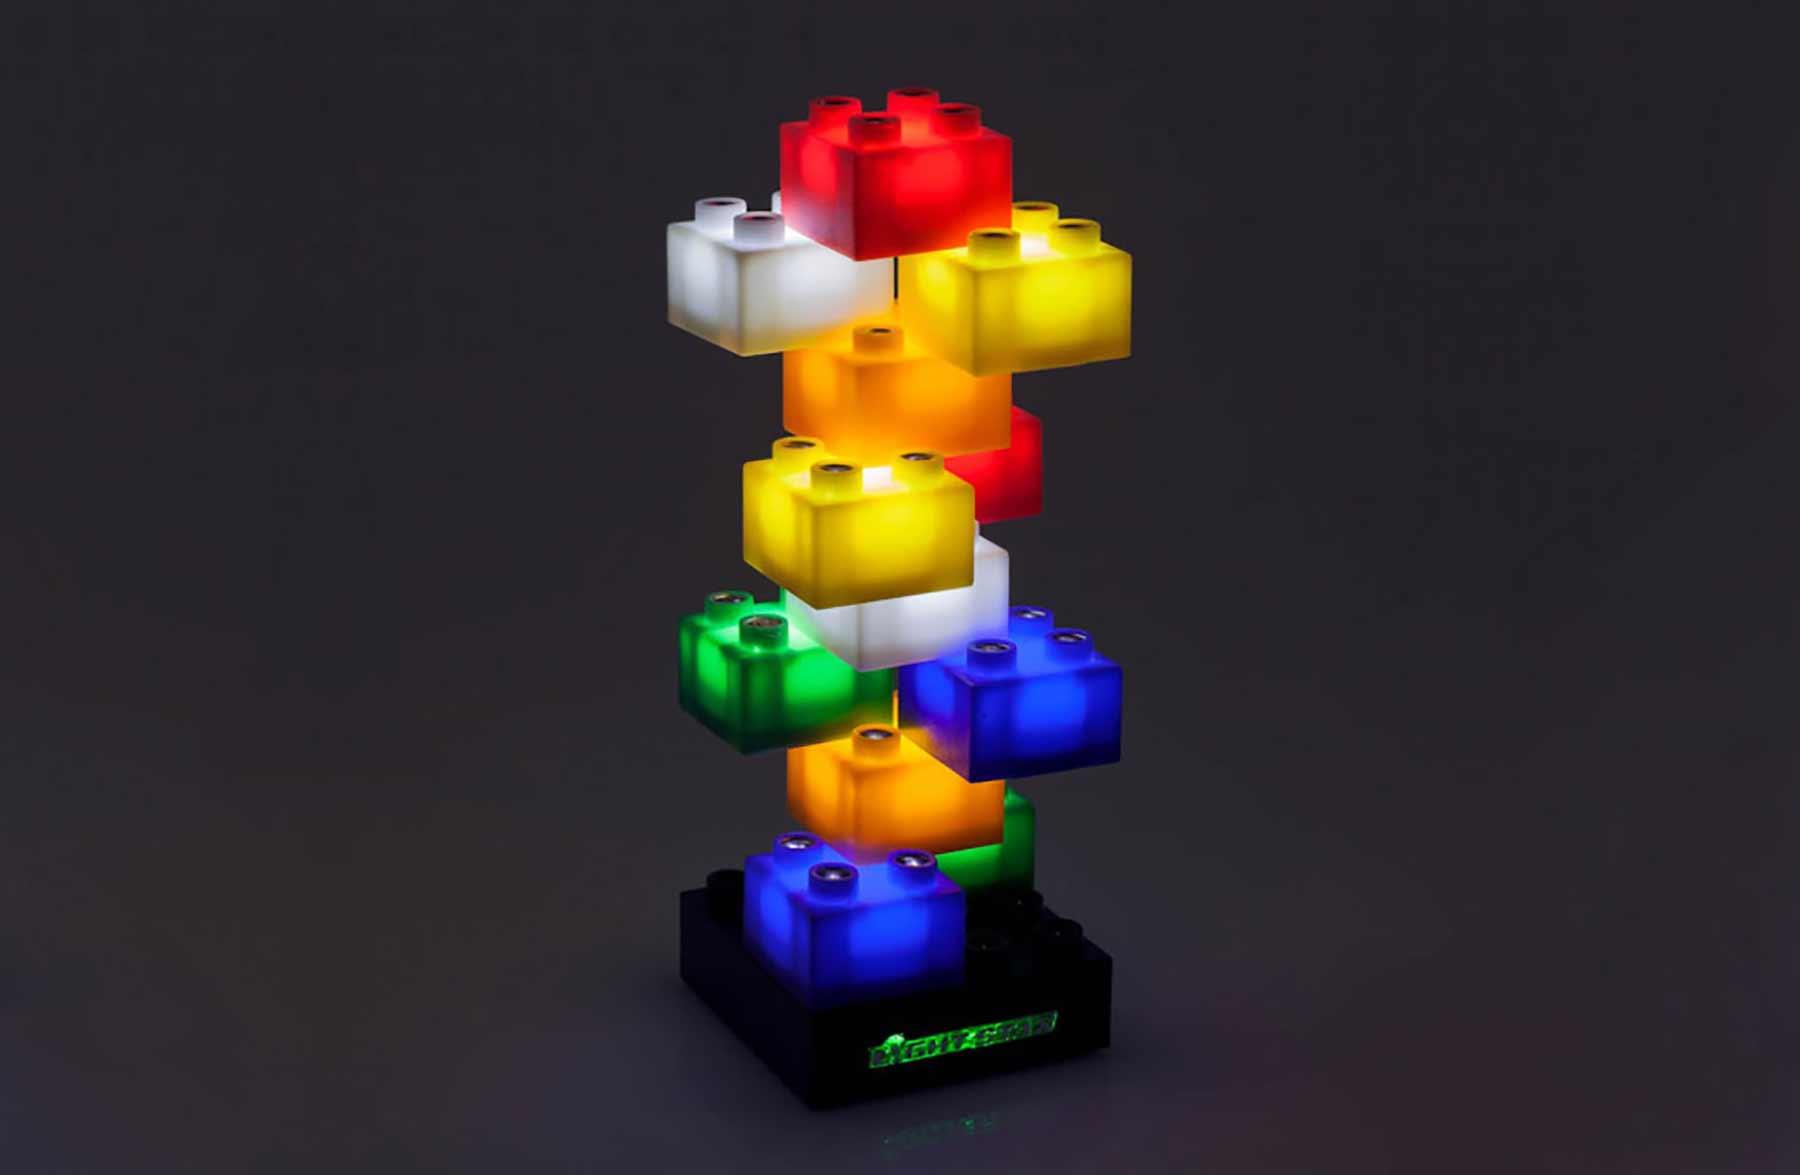 Leuchtendes LEGO Light-stax_01